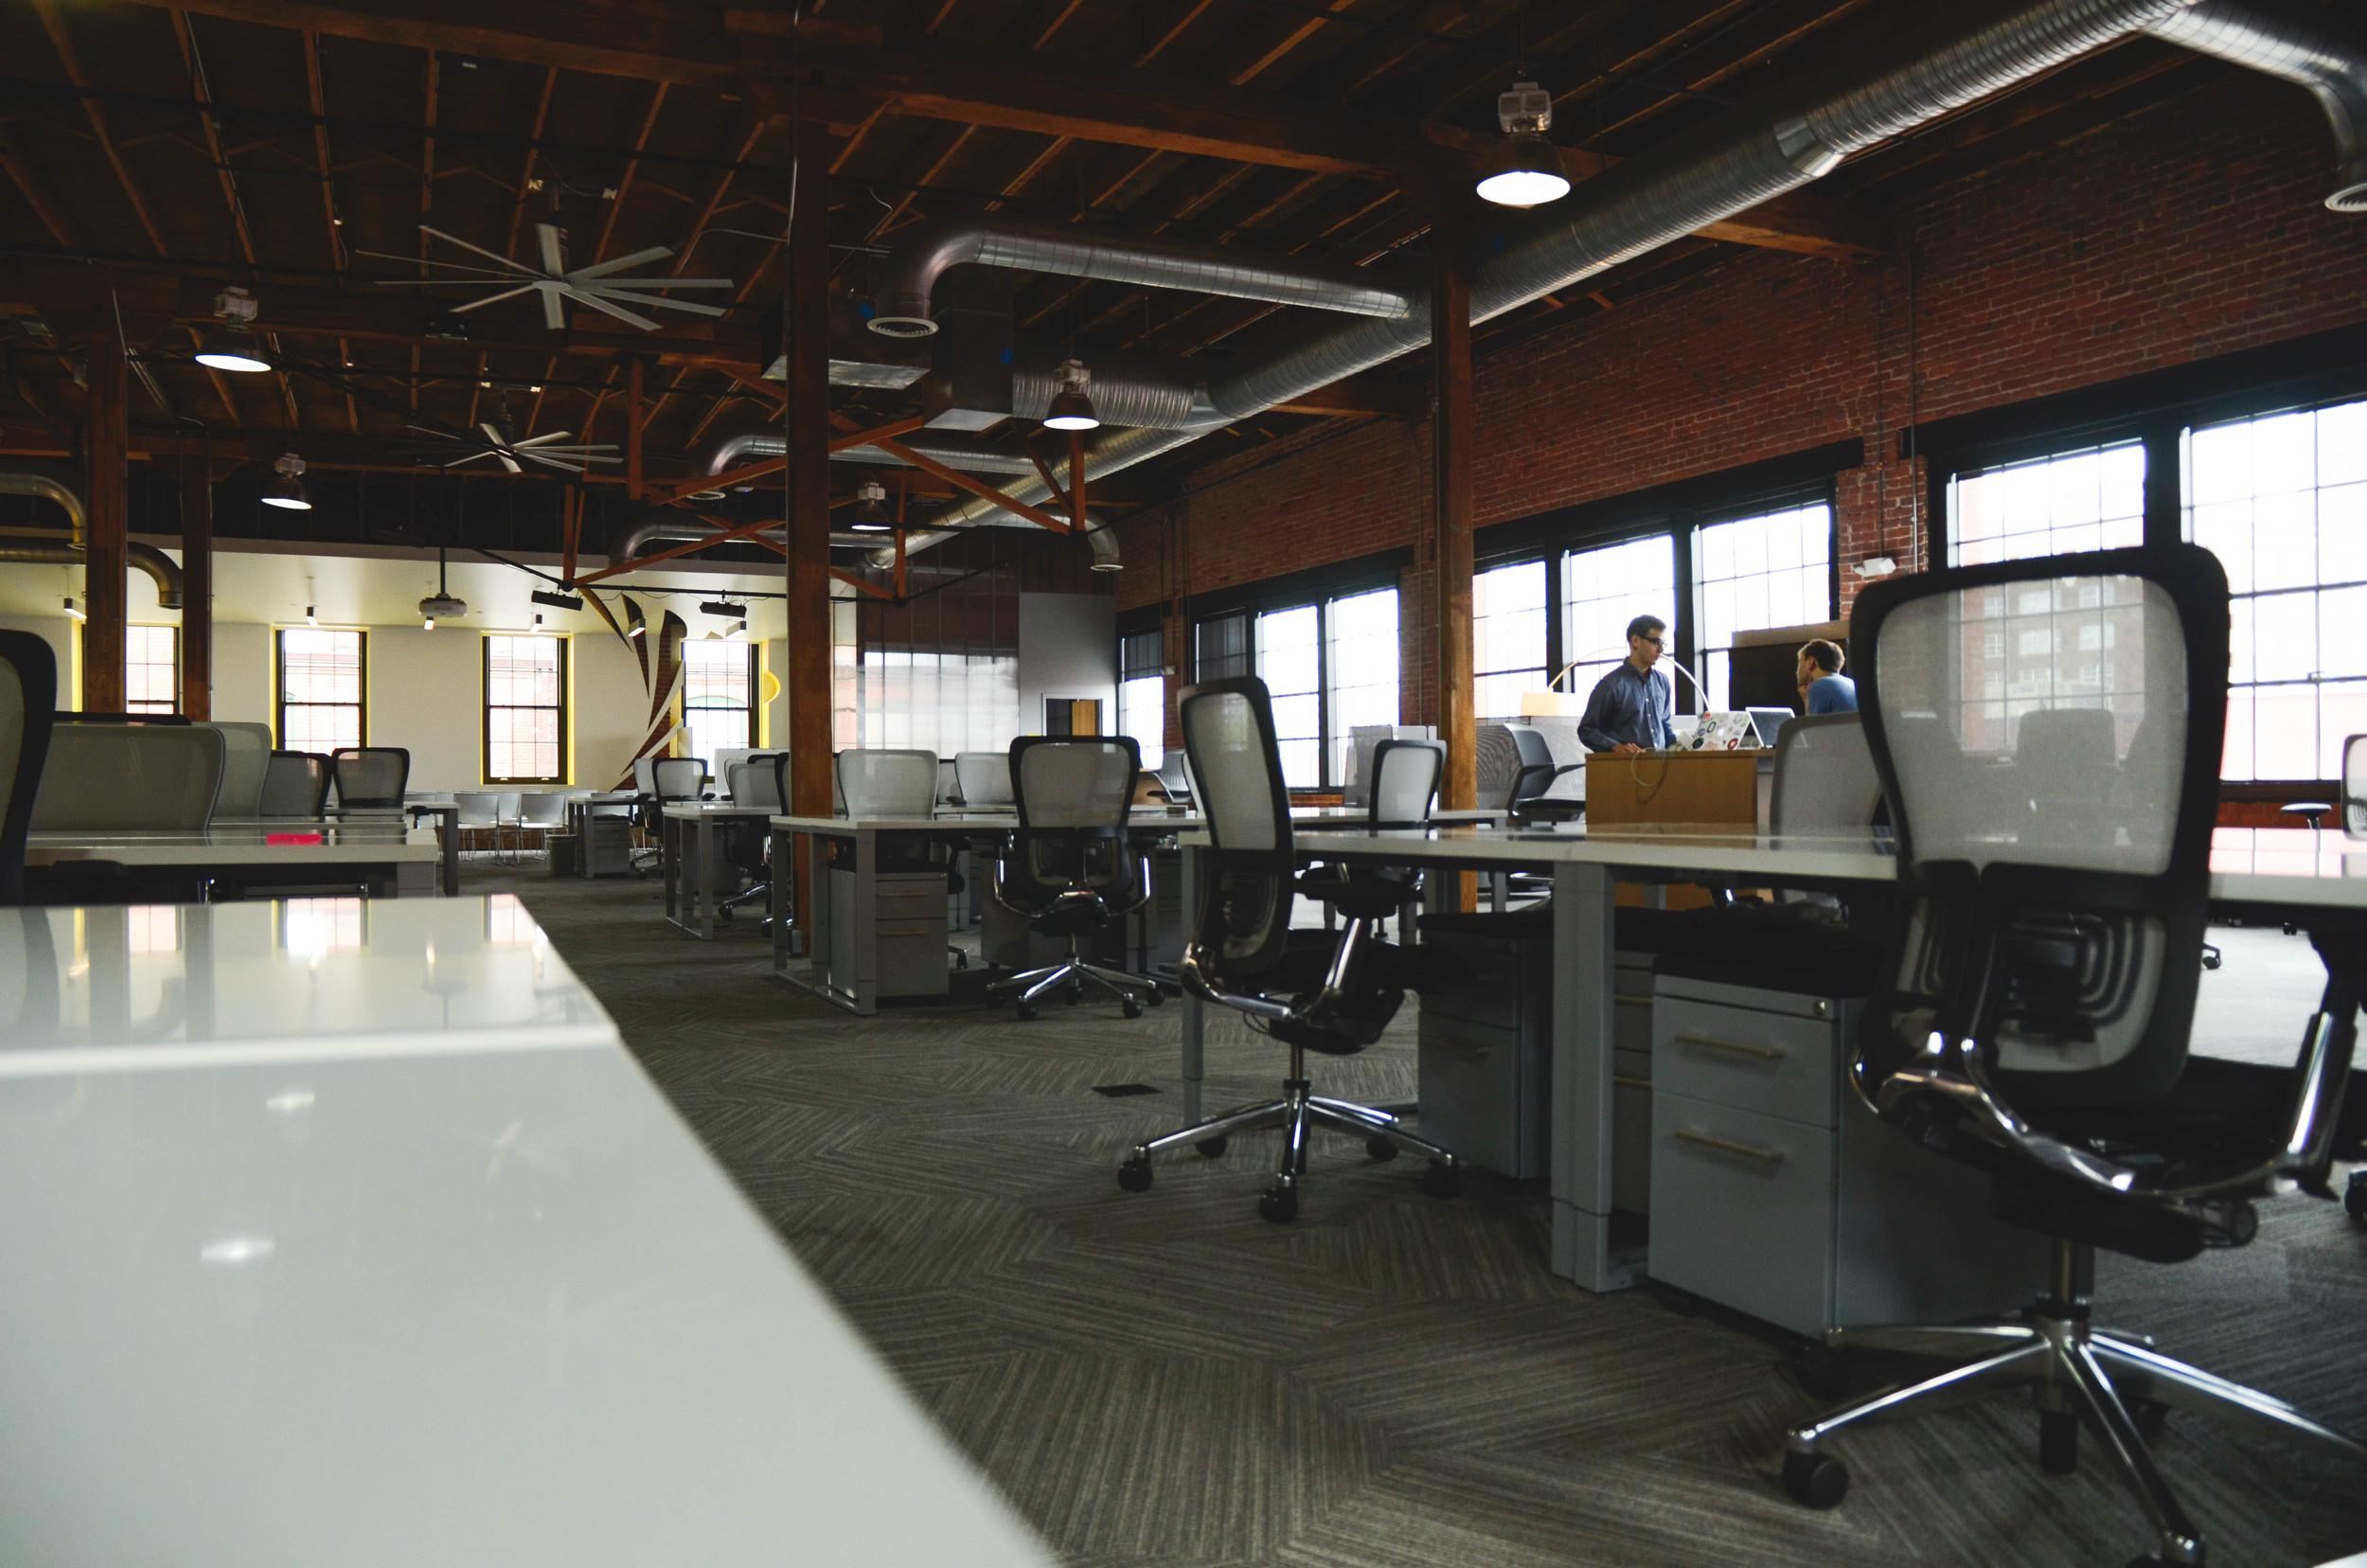 Entrepreneurship space